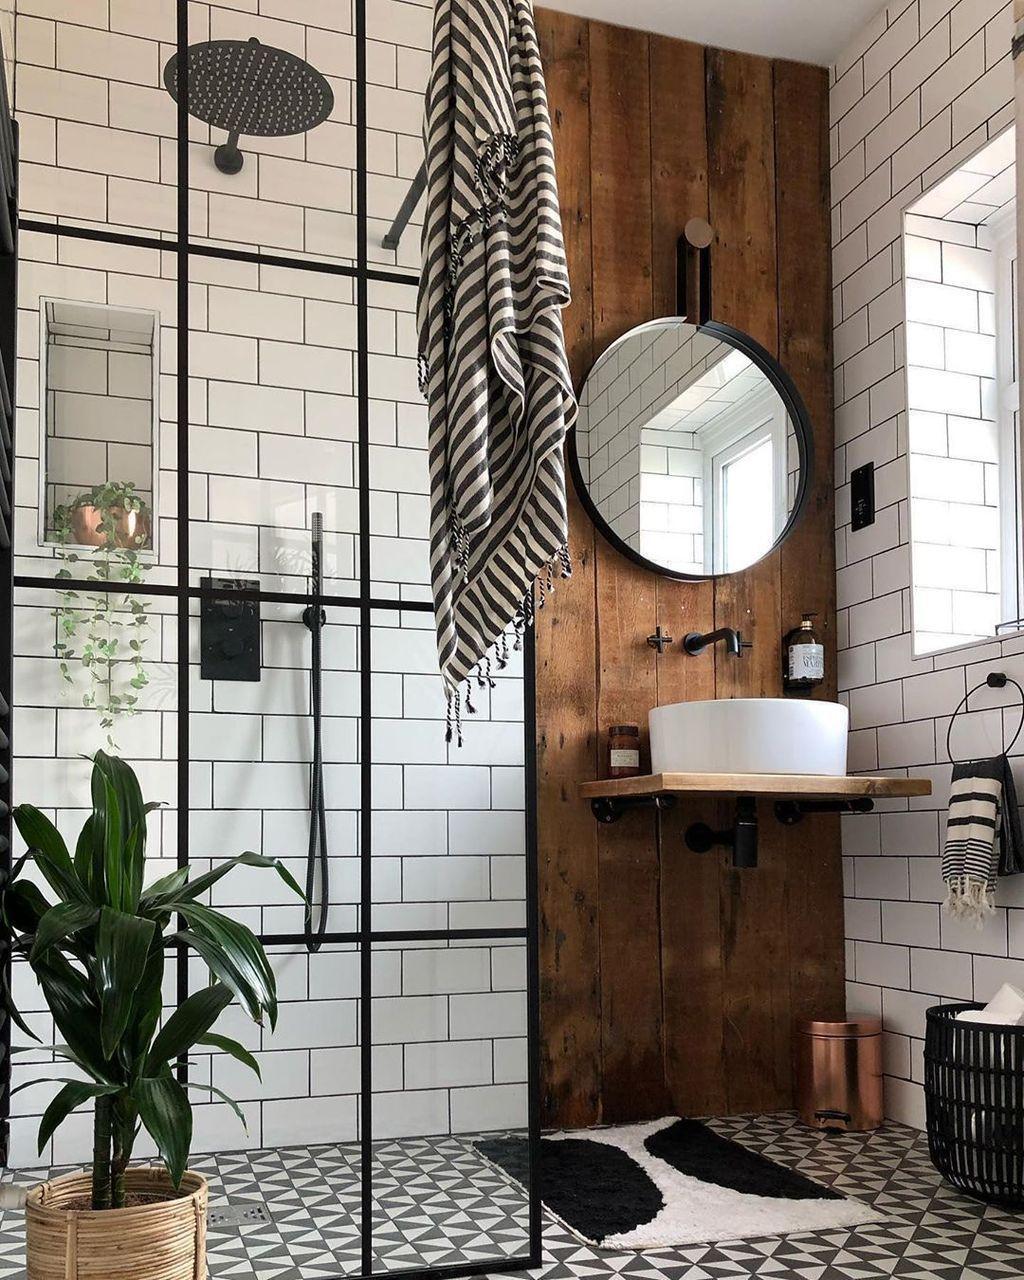 32 Stunning Industrial Bathroom Design Ideas Bathroom Decor Ideas Bathroom Desig In 2020 Bathroom Interior Design Industrial Bathroom Design Home Decor Inspiration